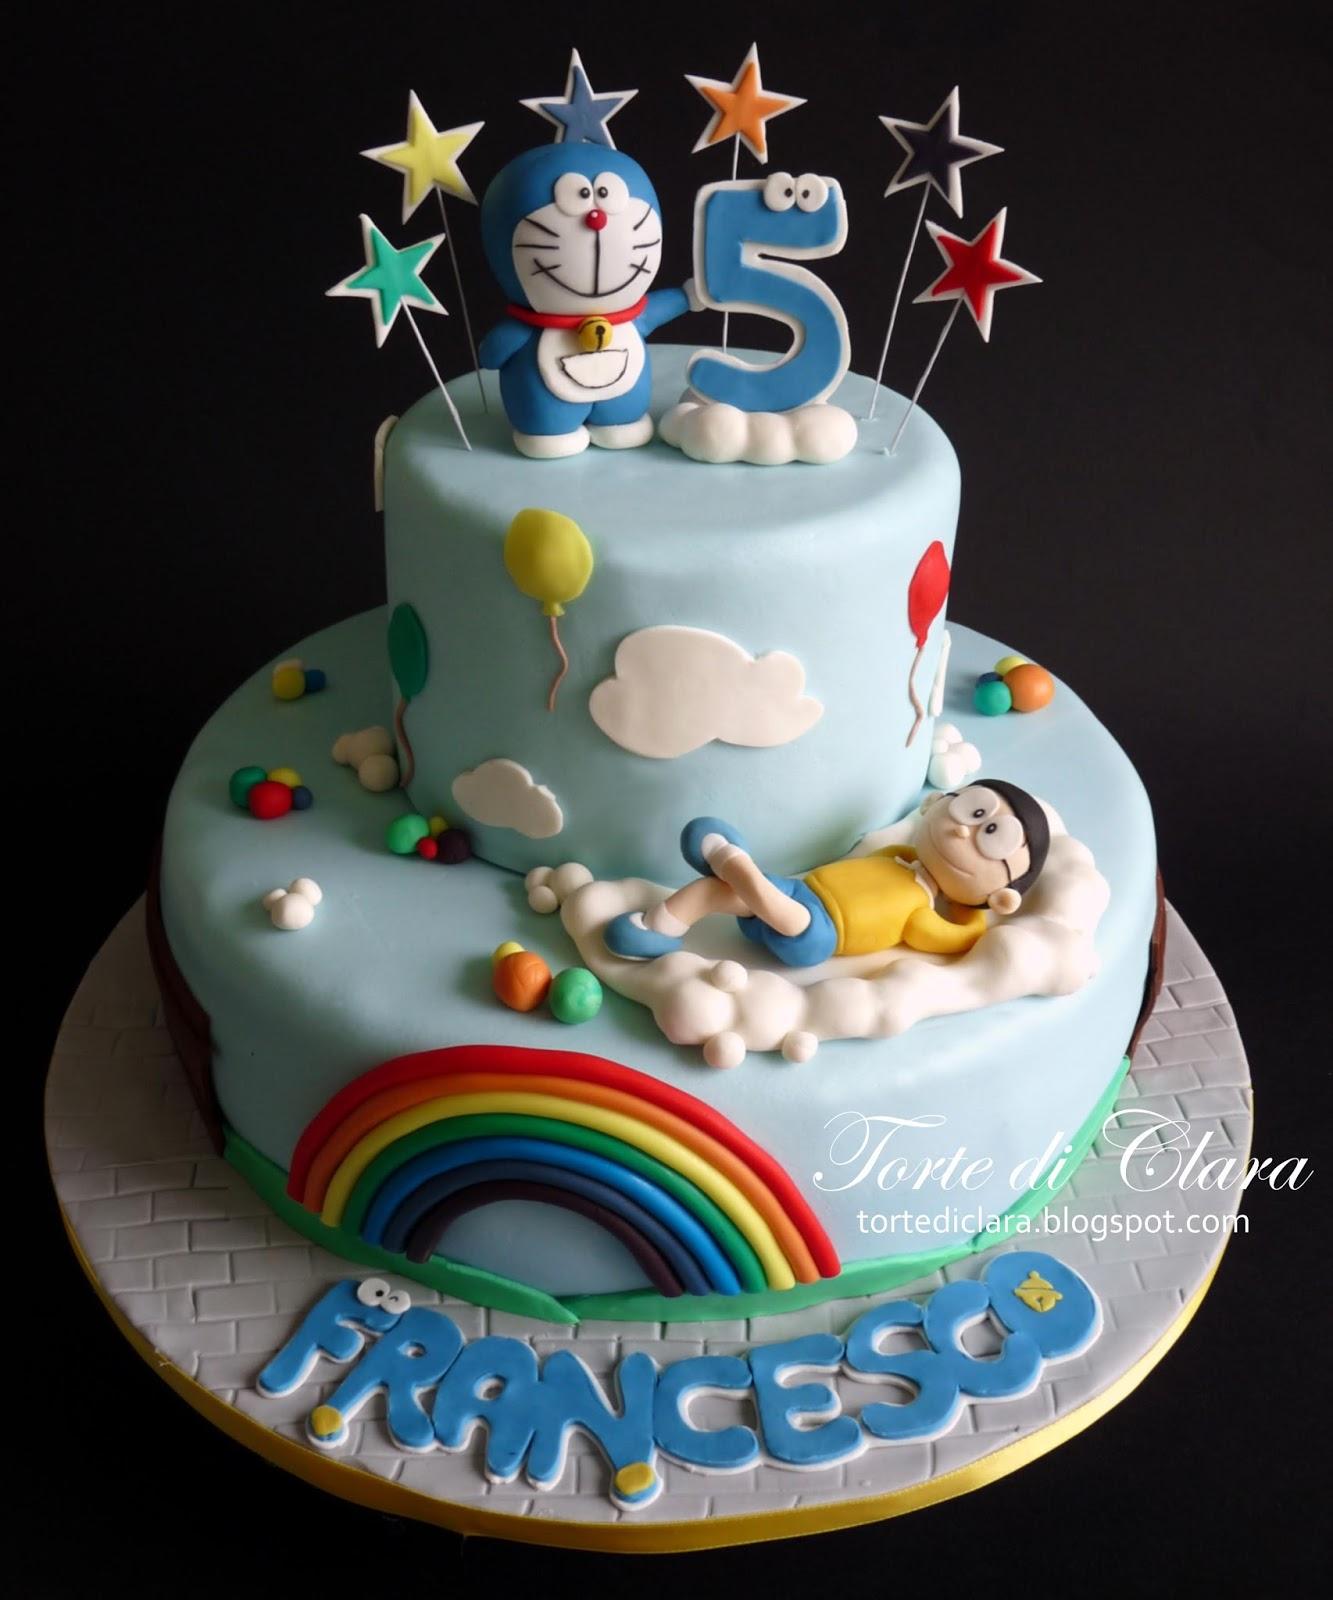 Torte di clara doraemon cake